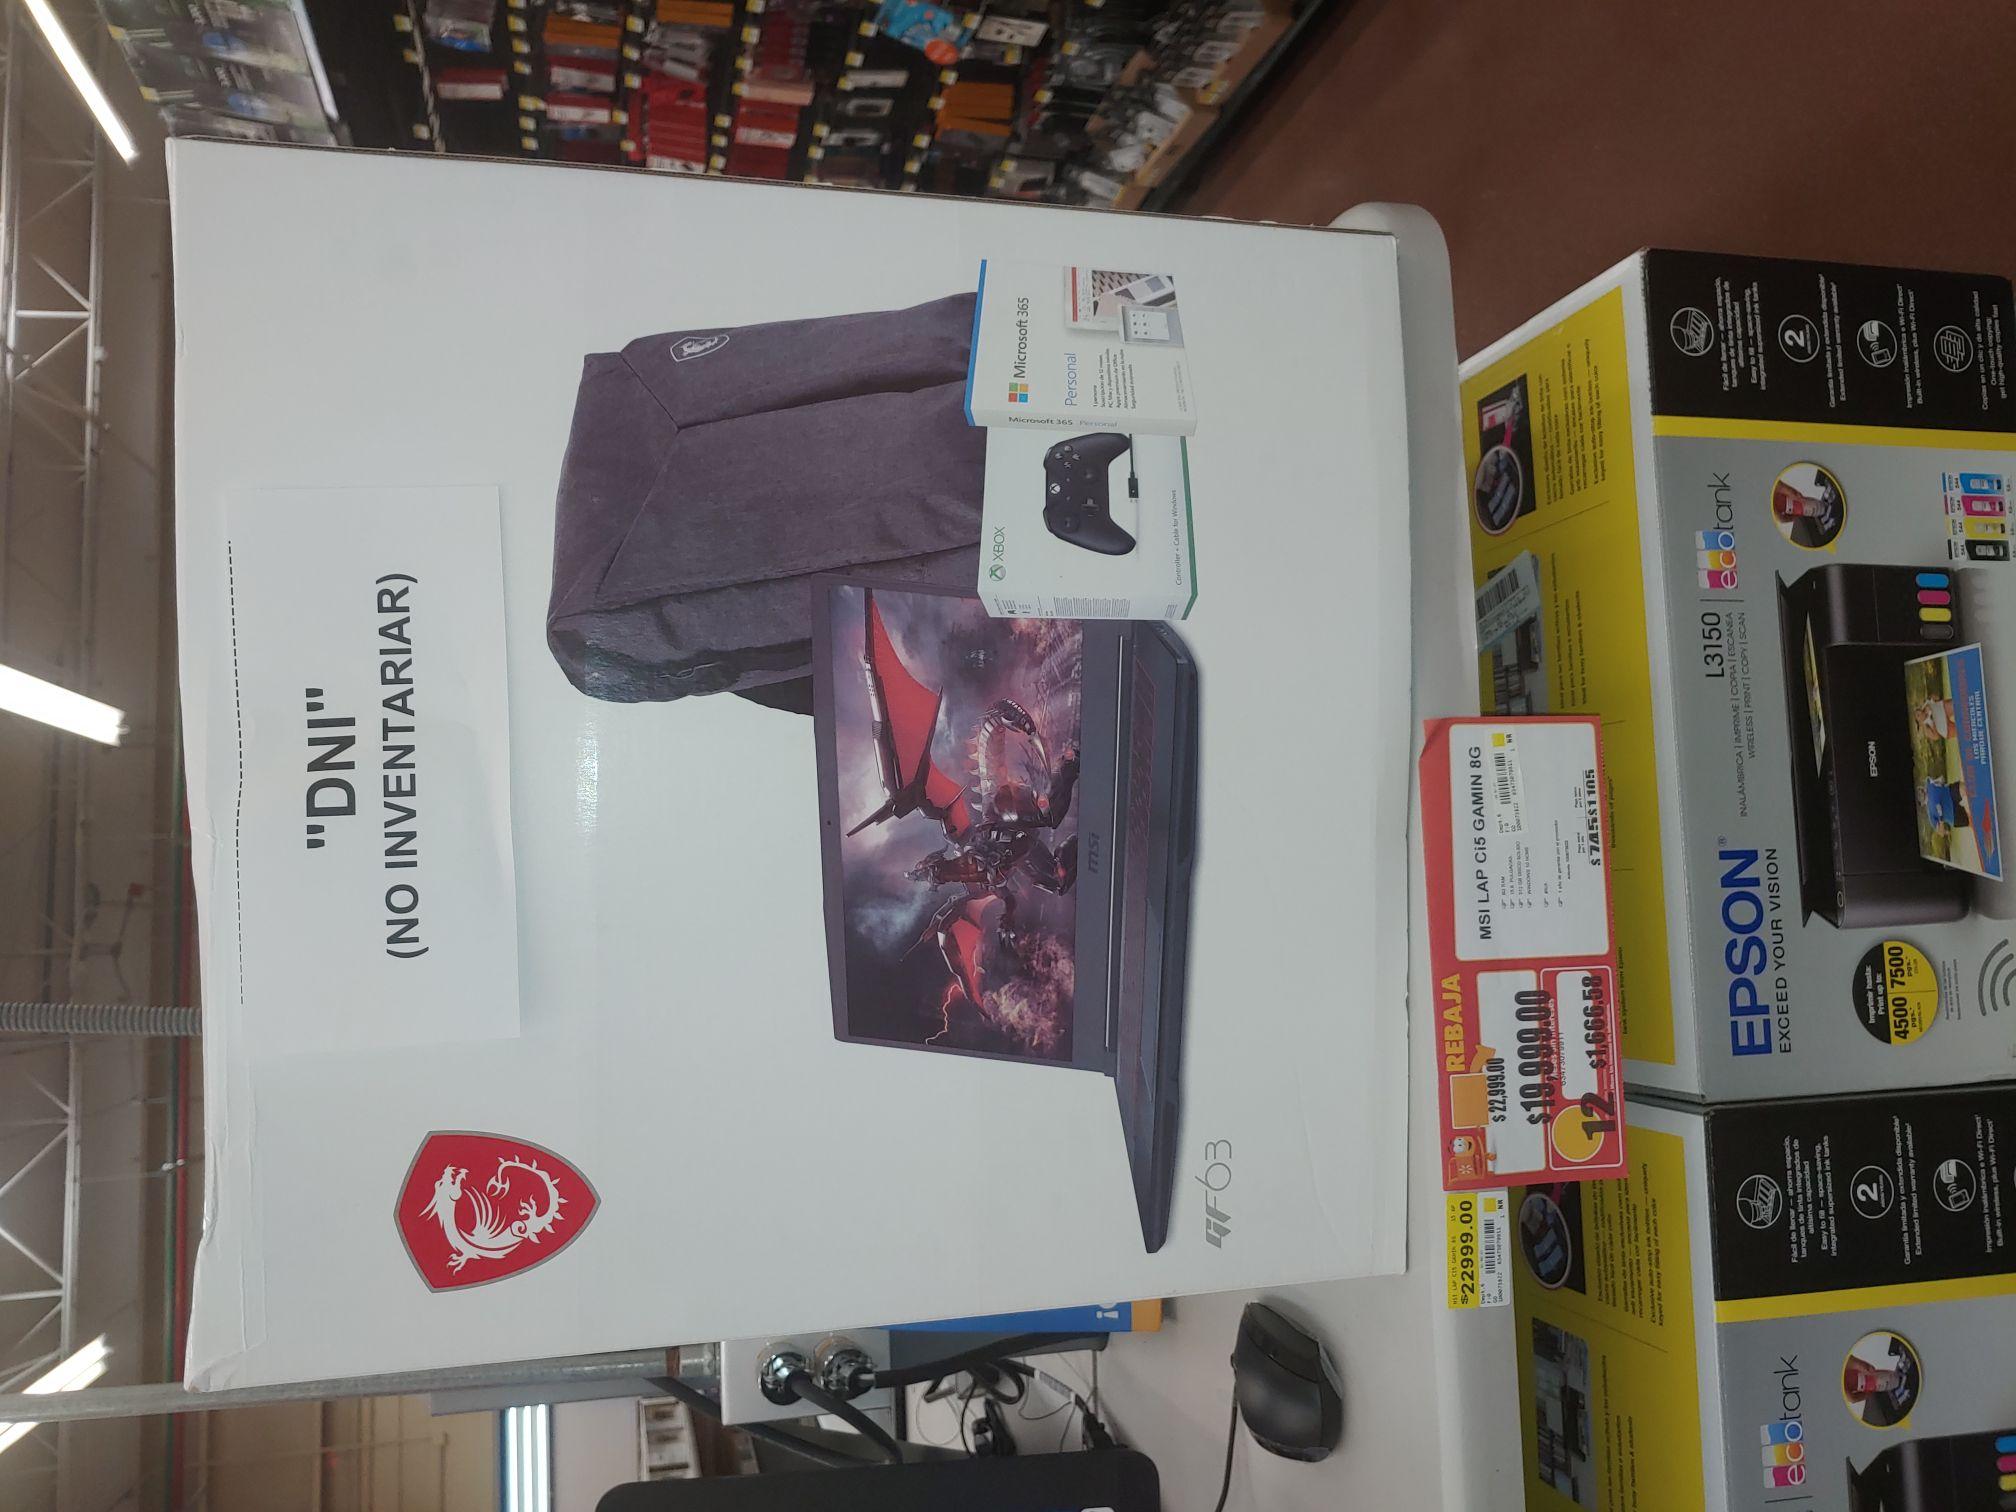 Walmart Laptop Msi Gf63 + control Xbox+ mochila+ Office 365